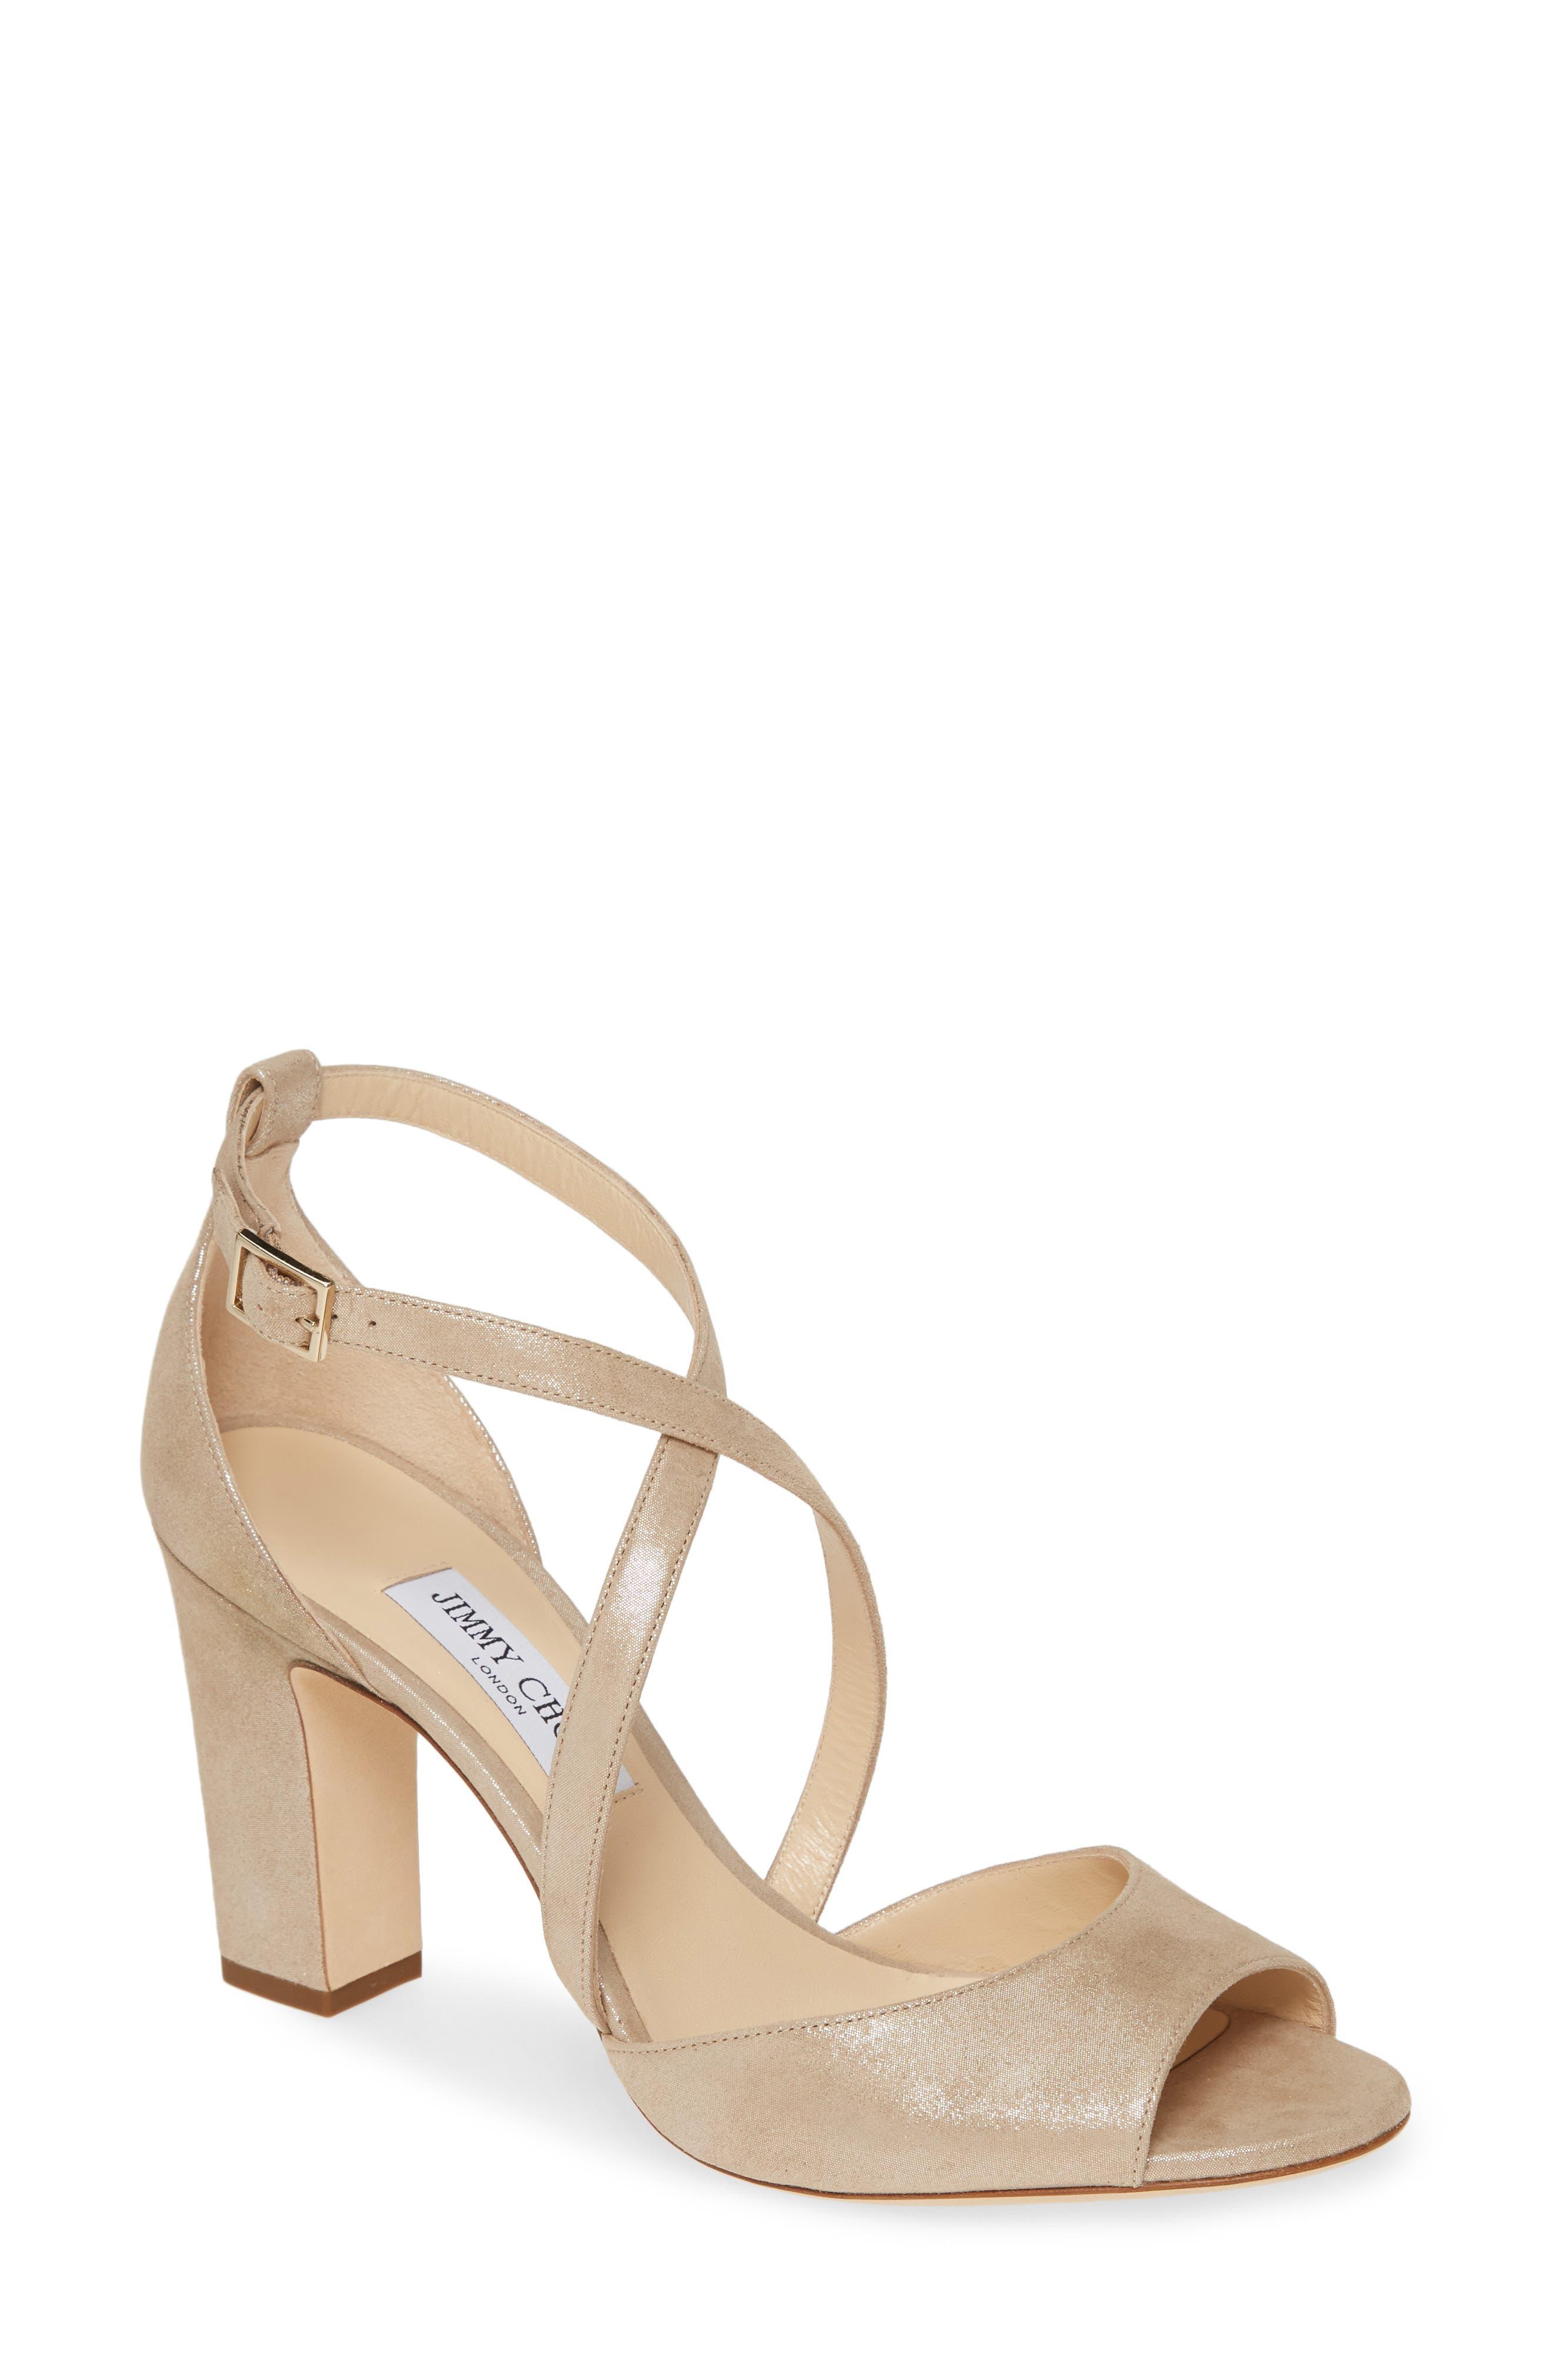 Women's Jimmy Choo Shoes | Nordstrom